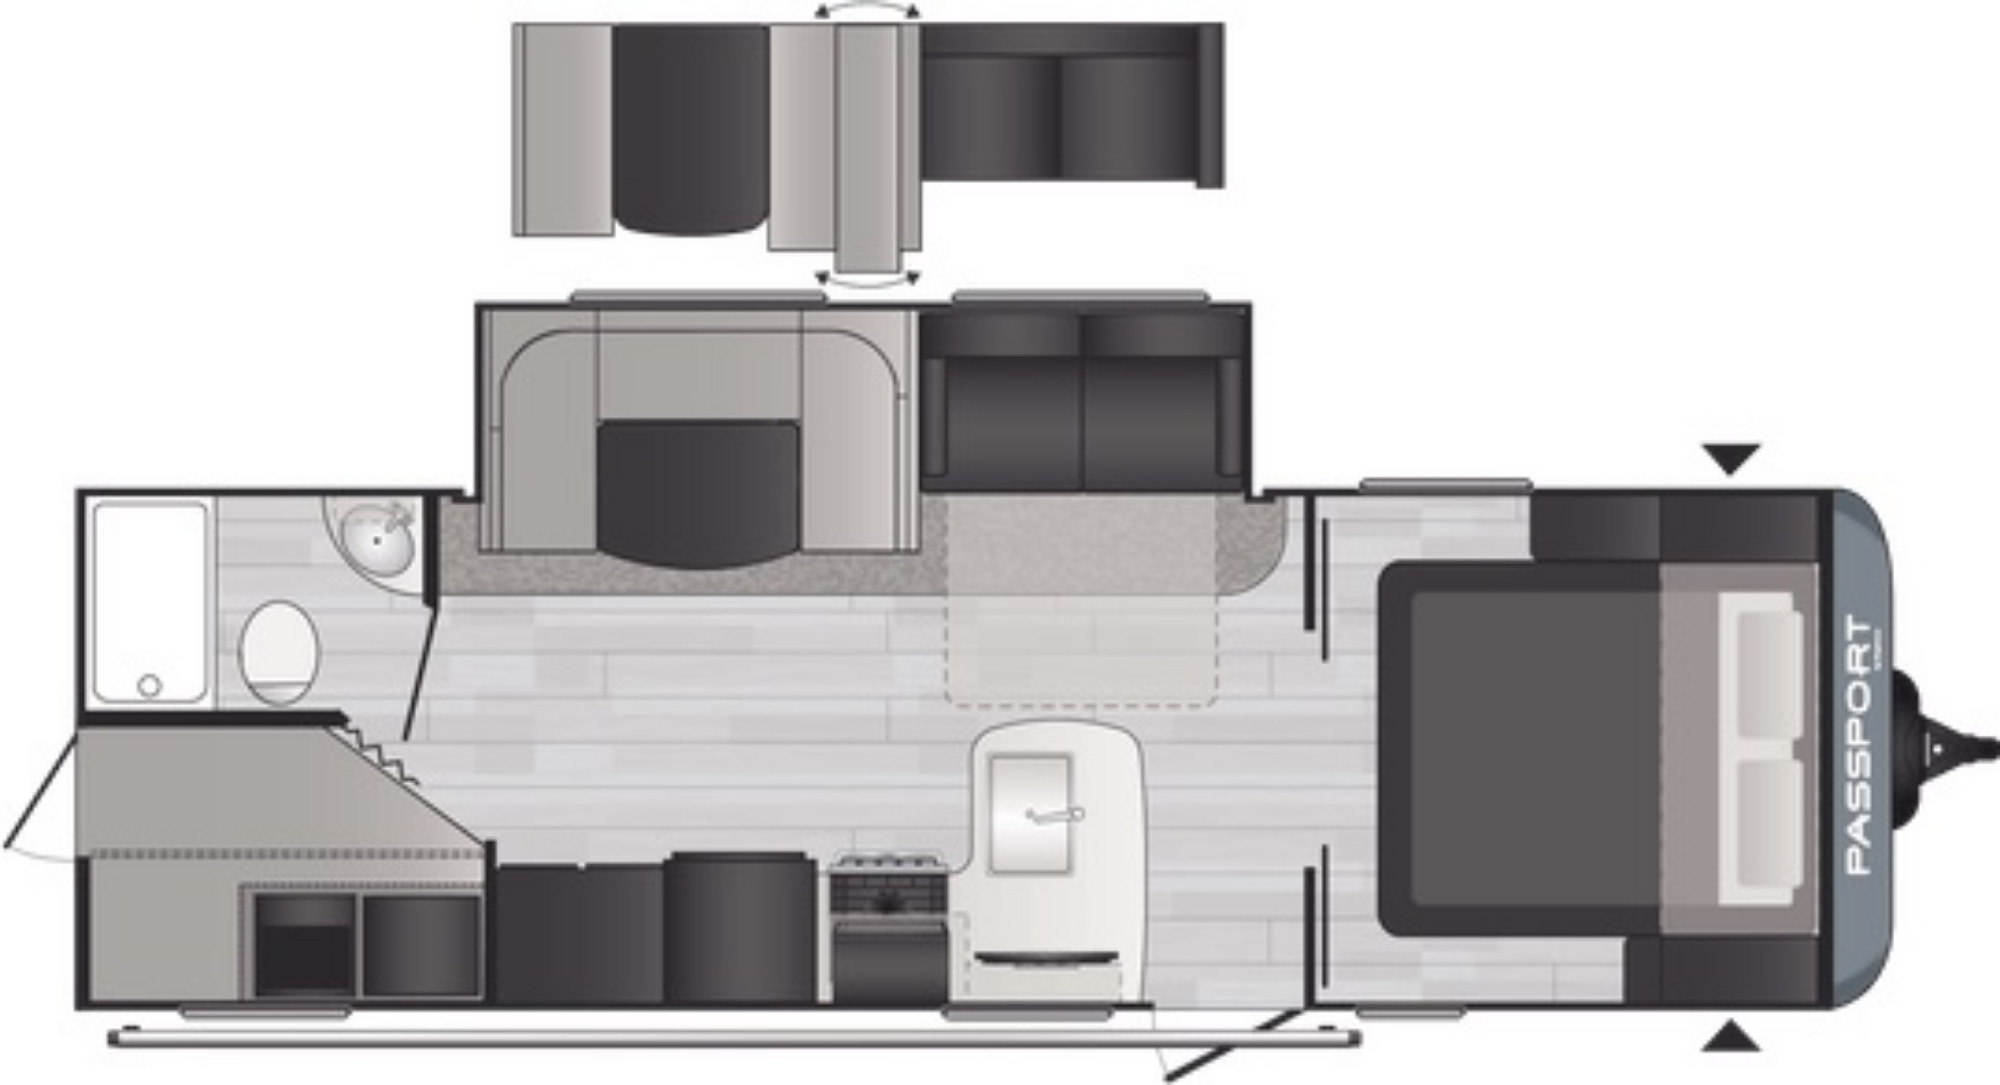 View Floor Plan for 2021 KEYSTONE PASSPORT 268BH